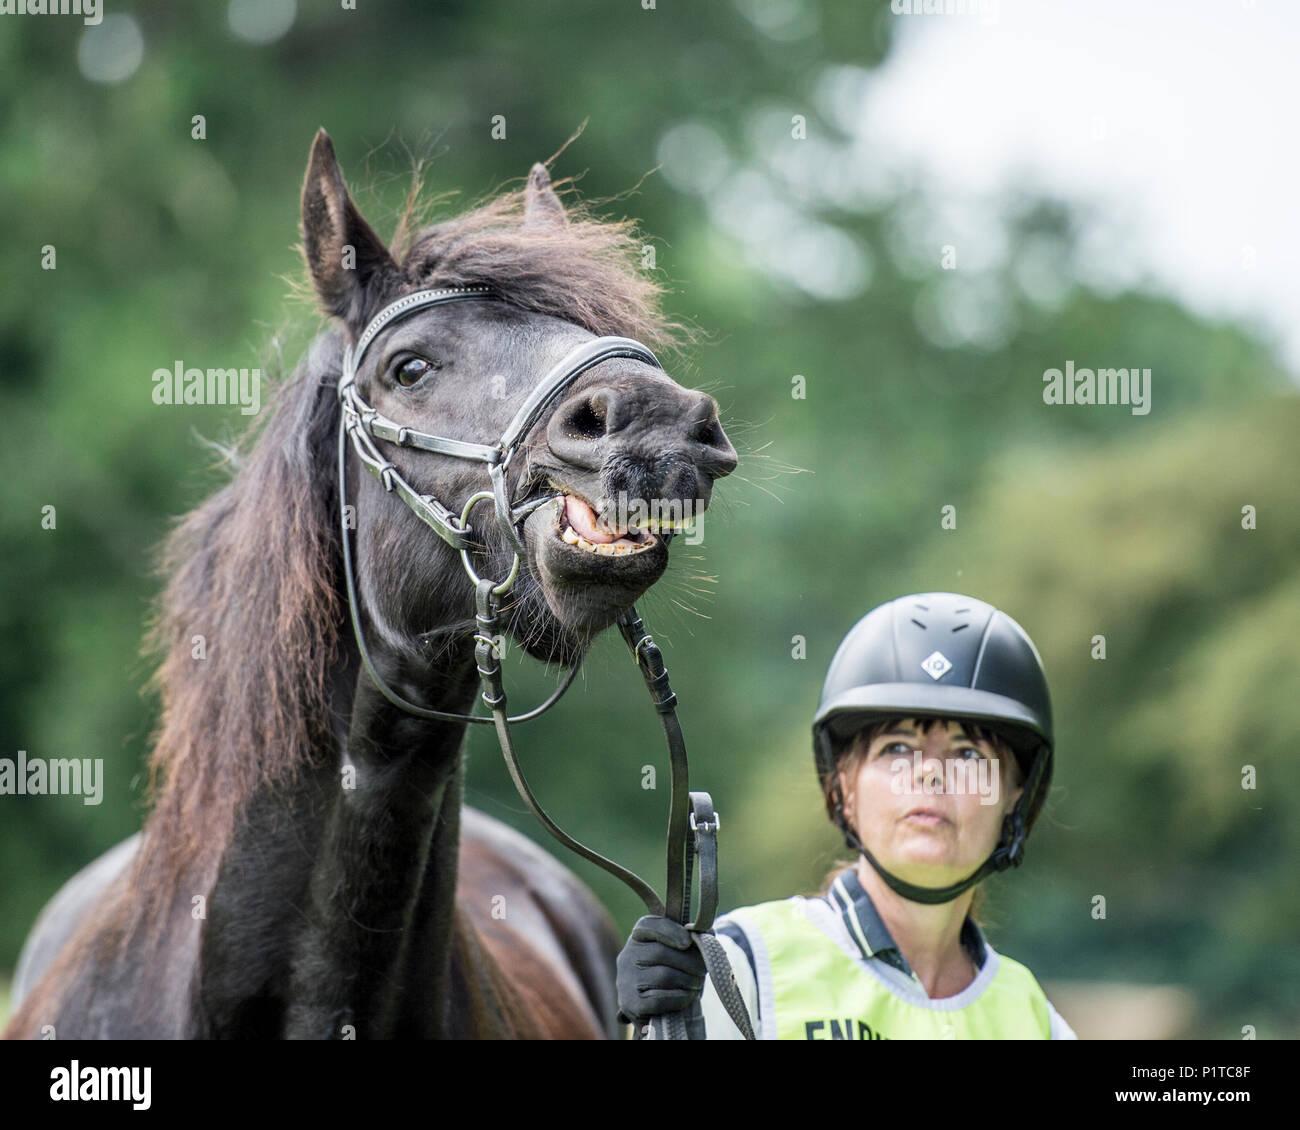 rider holding scared horse - Stock Image